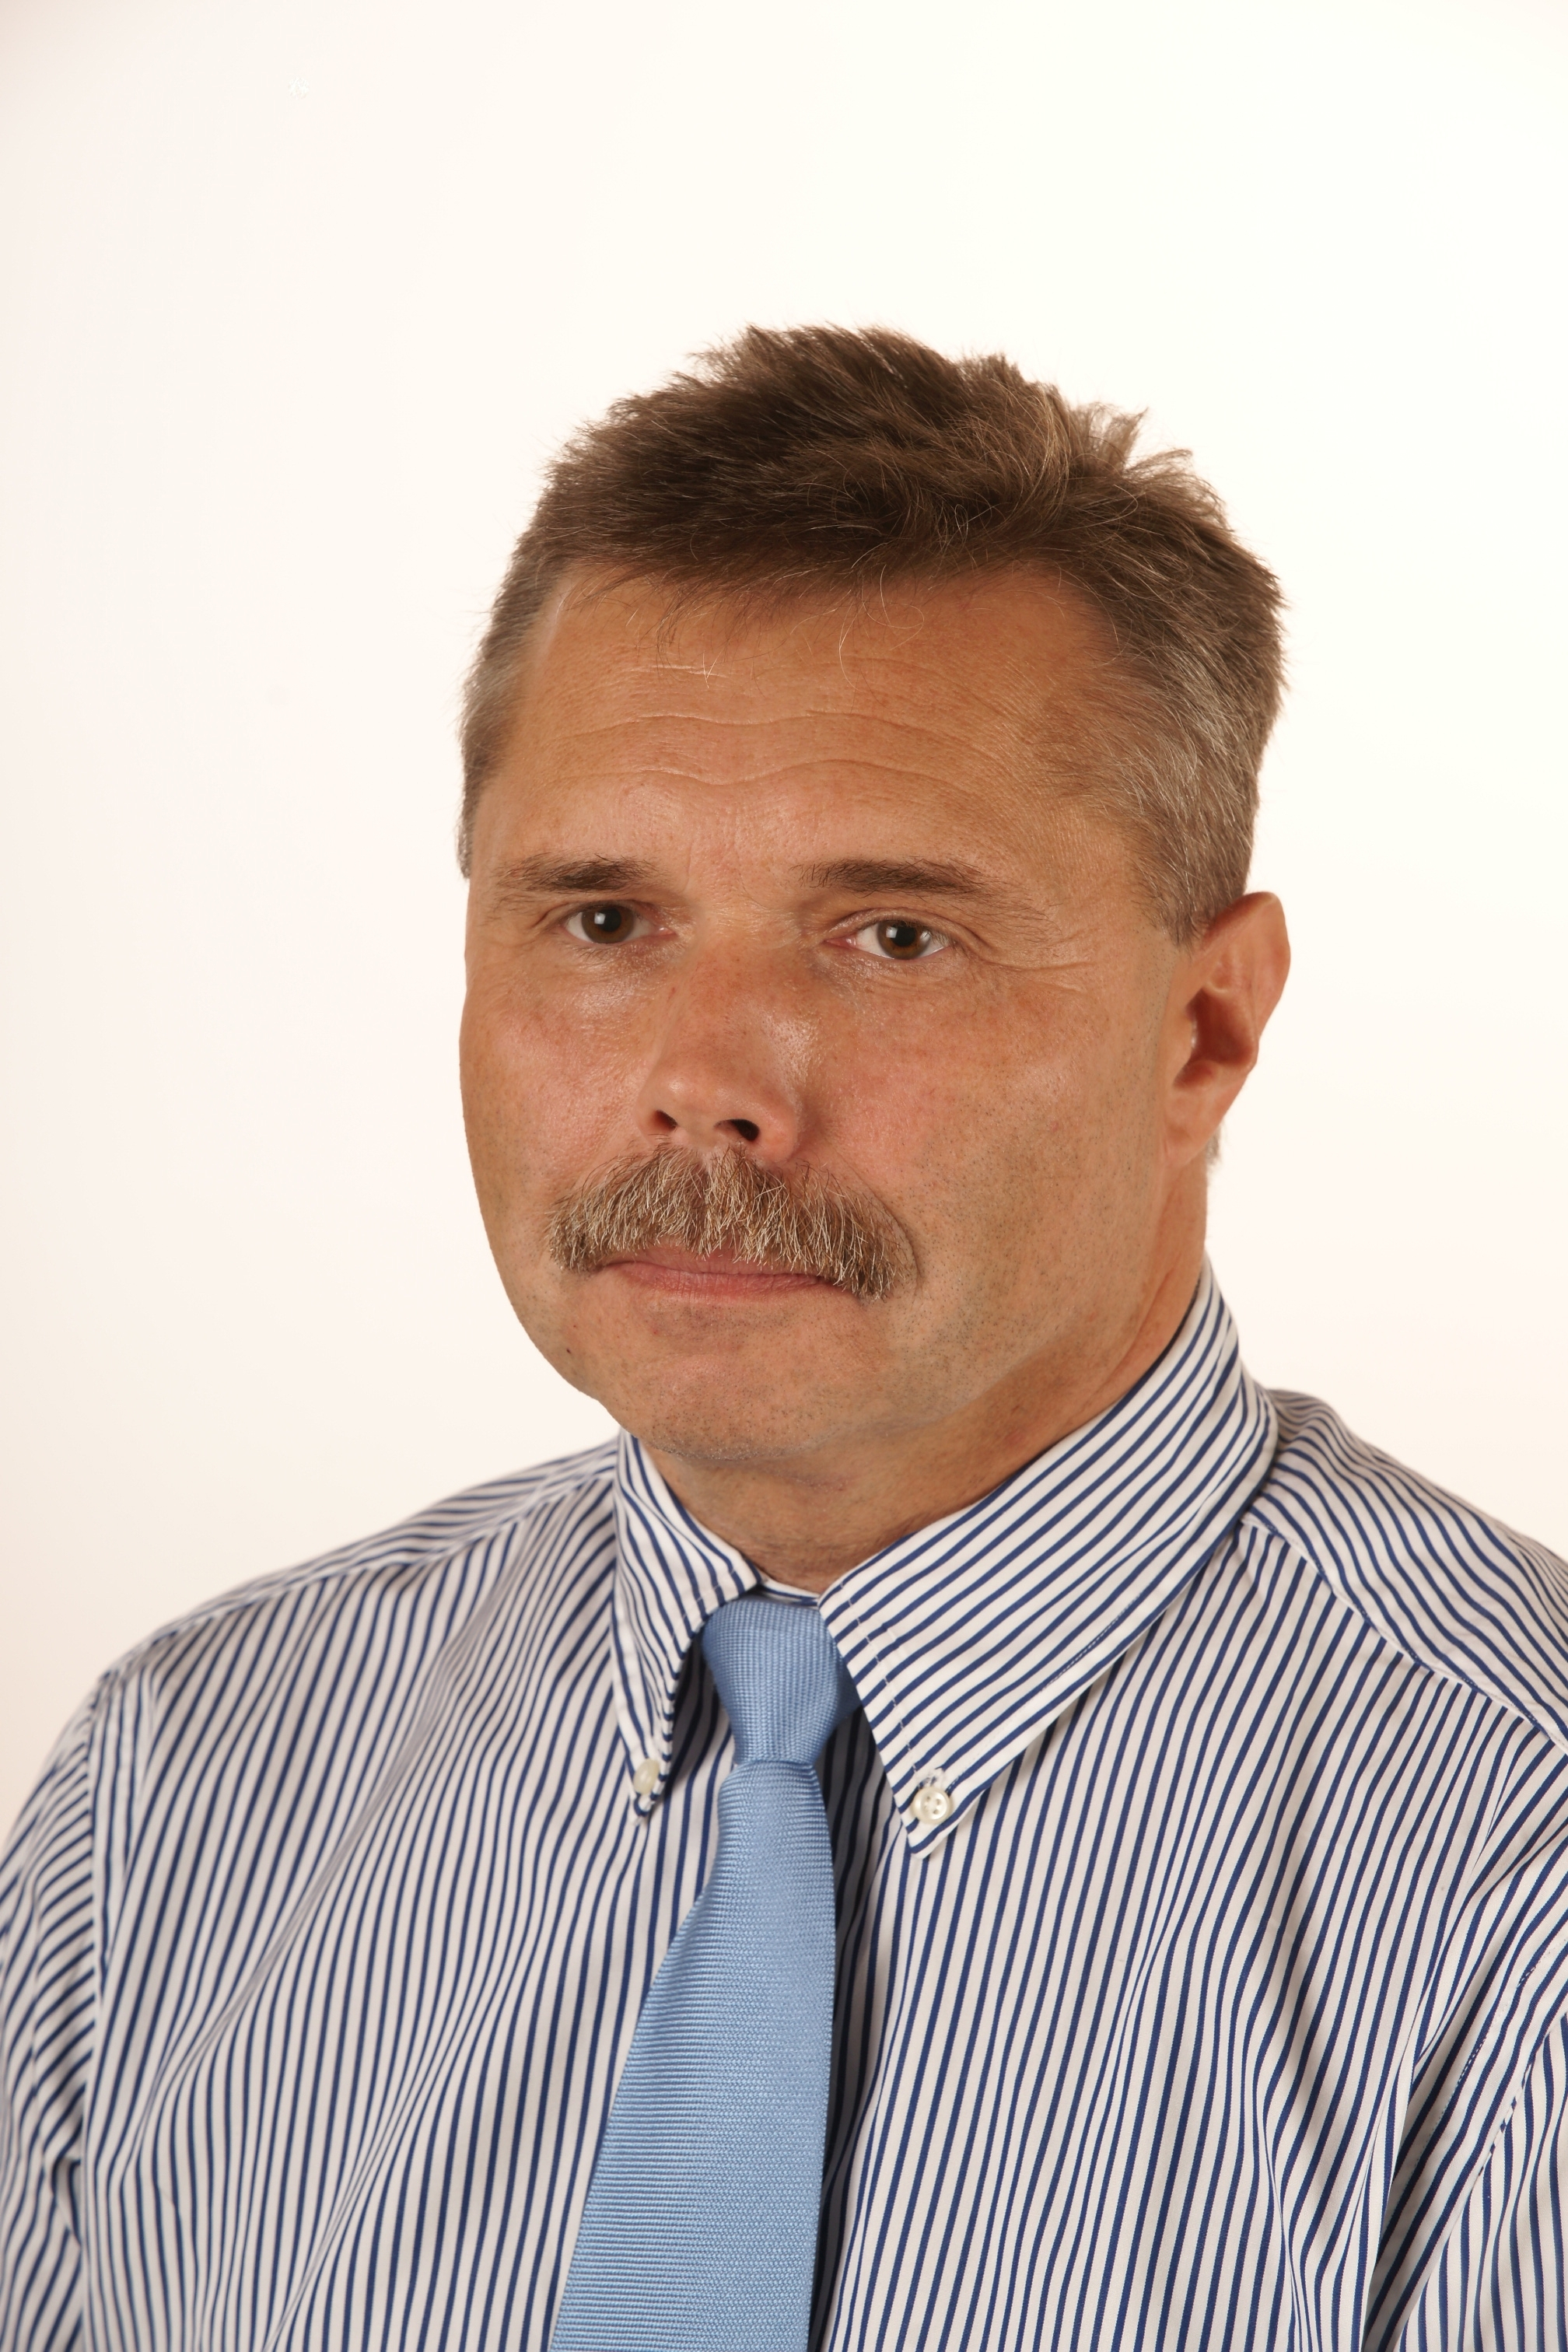 Kierownik Kliniki: prof. dr hab. n. med. Mariusz Dubiel